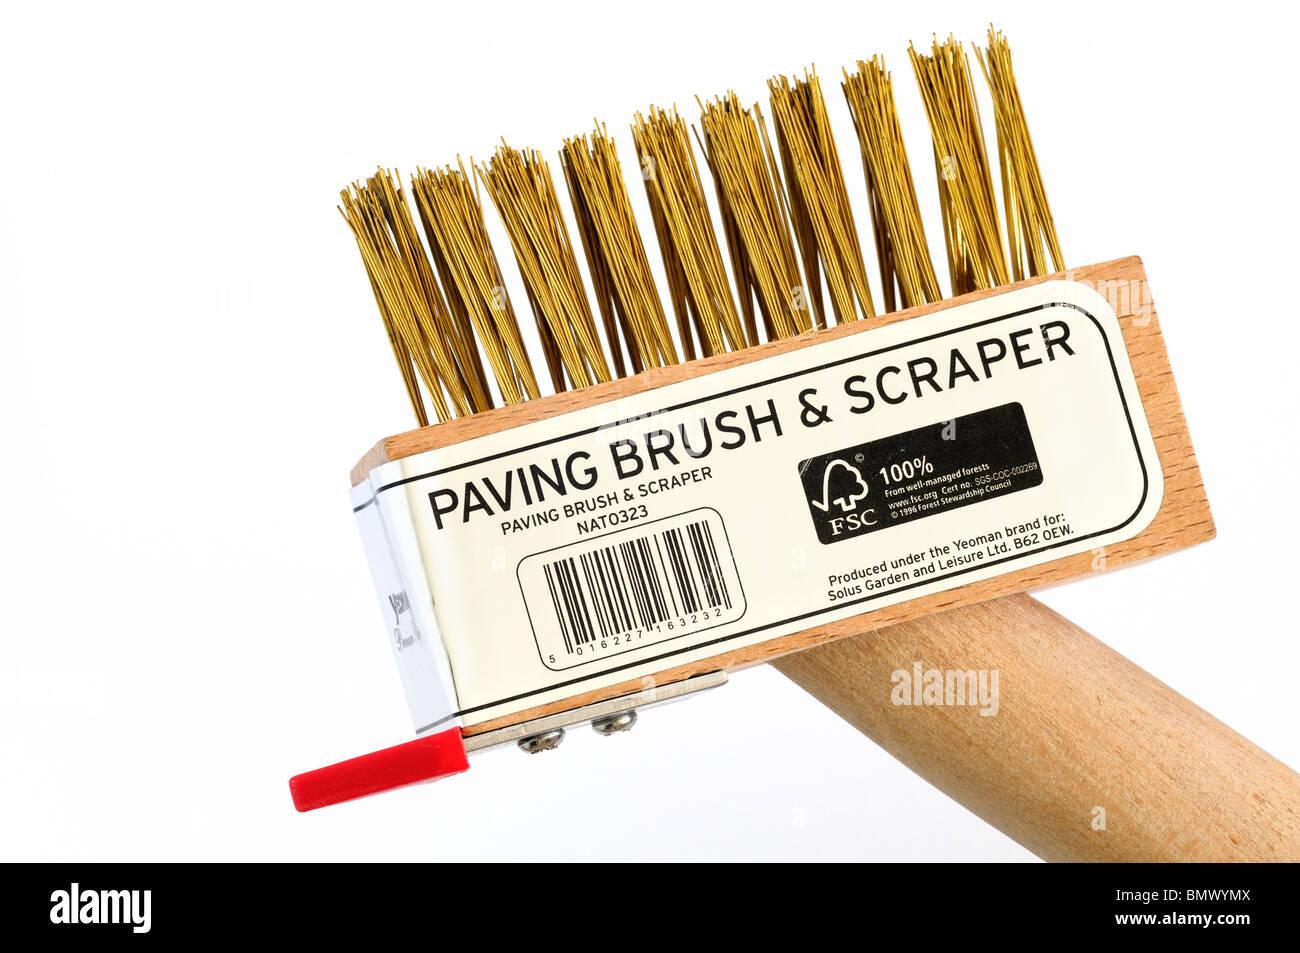 Block paving brush & scraper - Stock Image